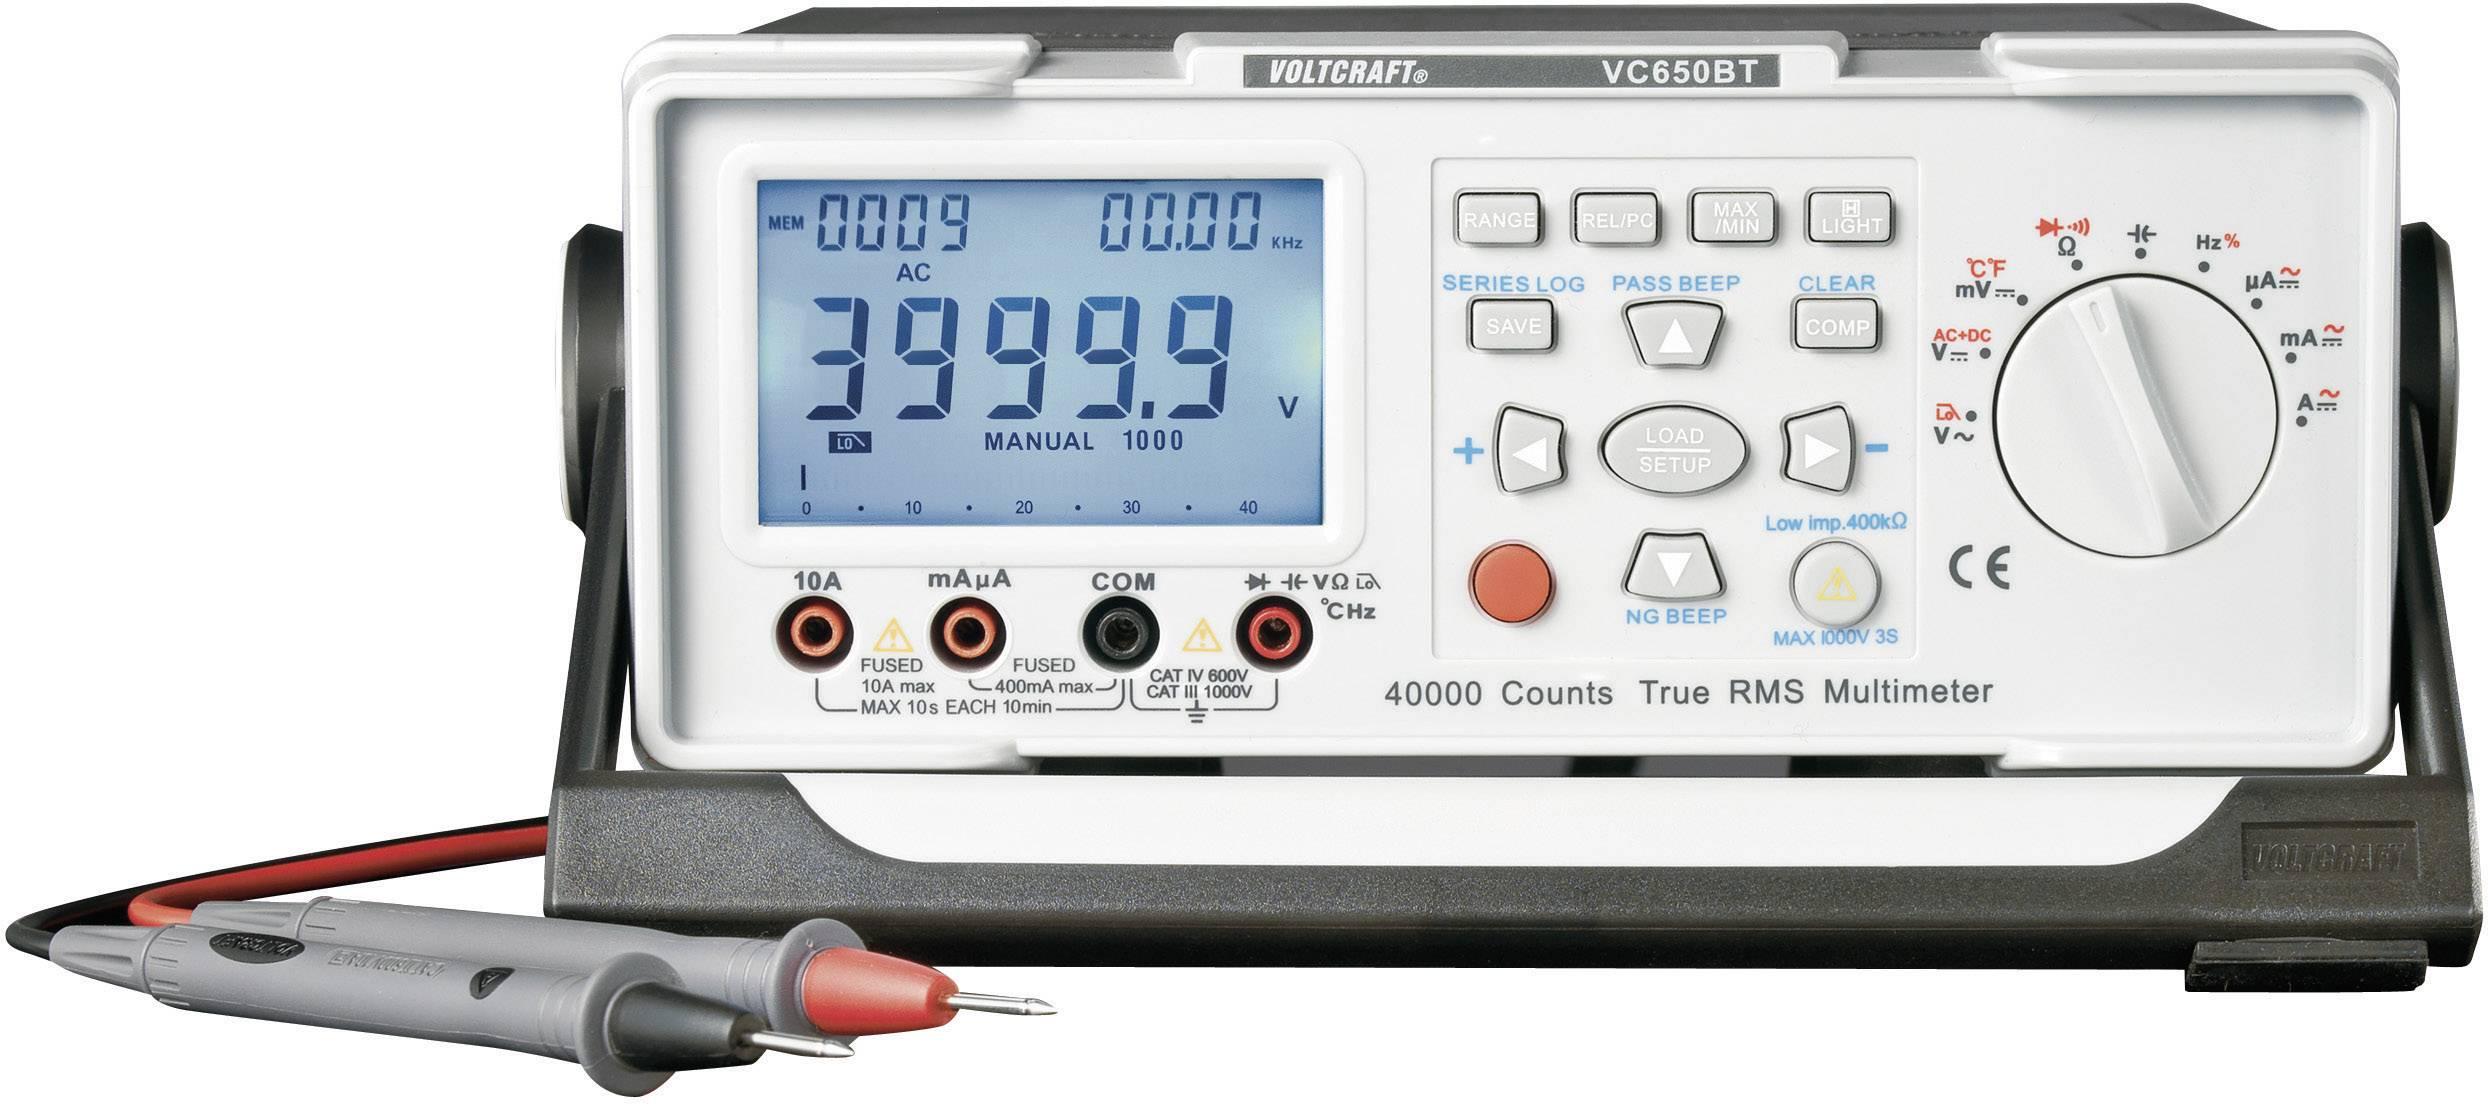 Digitálne/y stolný mutlimeter VOLTCRAFT VC650BT VC650BT